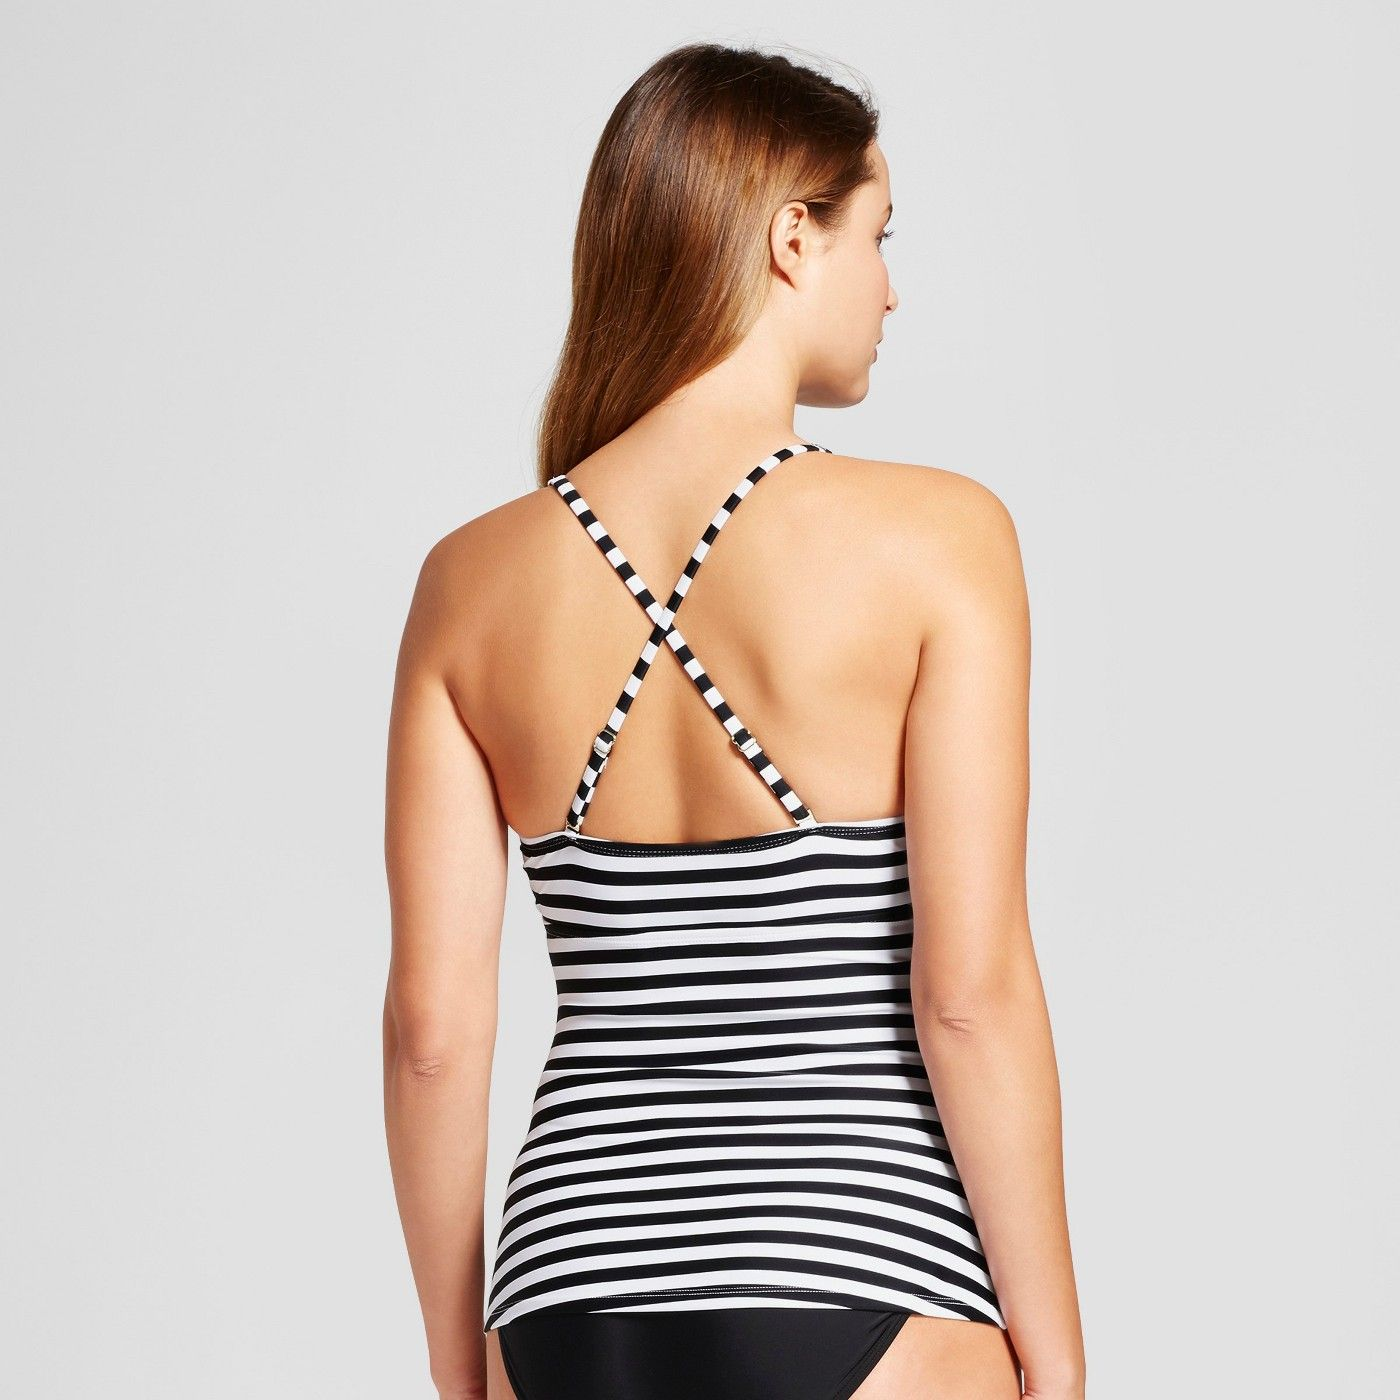 f0f346ddfec0b Women's Scallop Tankini Top - Merona? Black/White Stripe M #Tankini, #Top, # Women